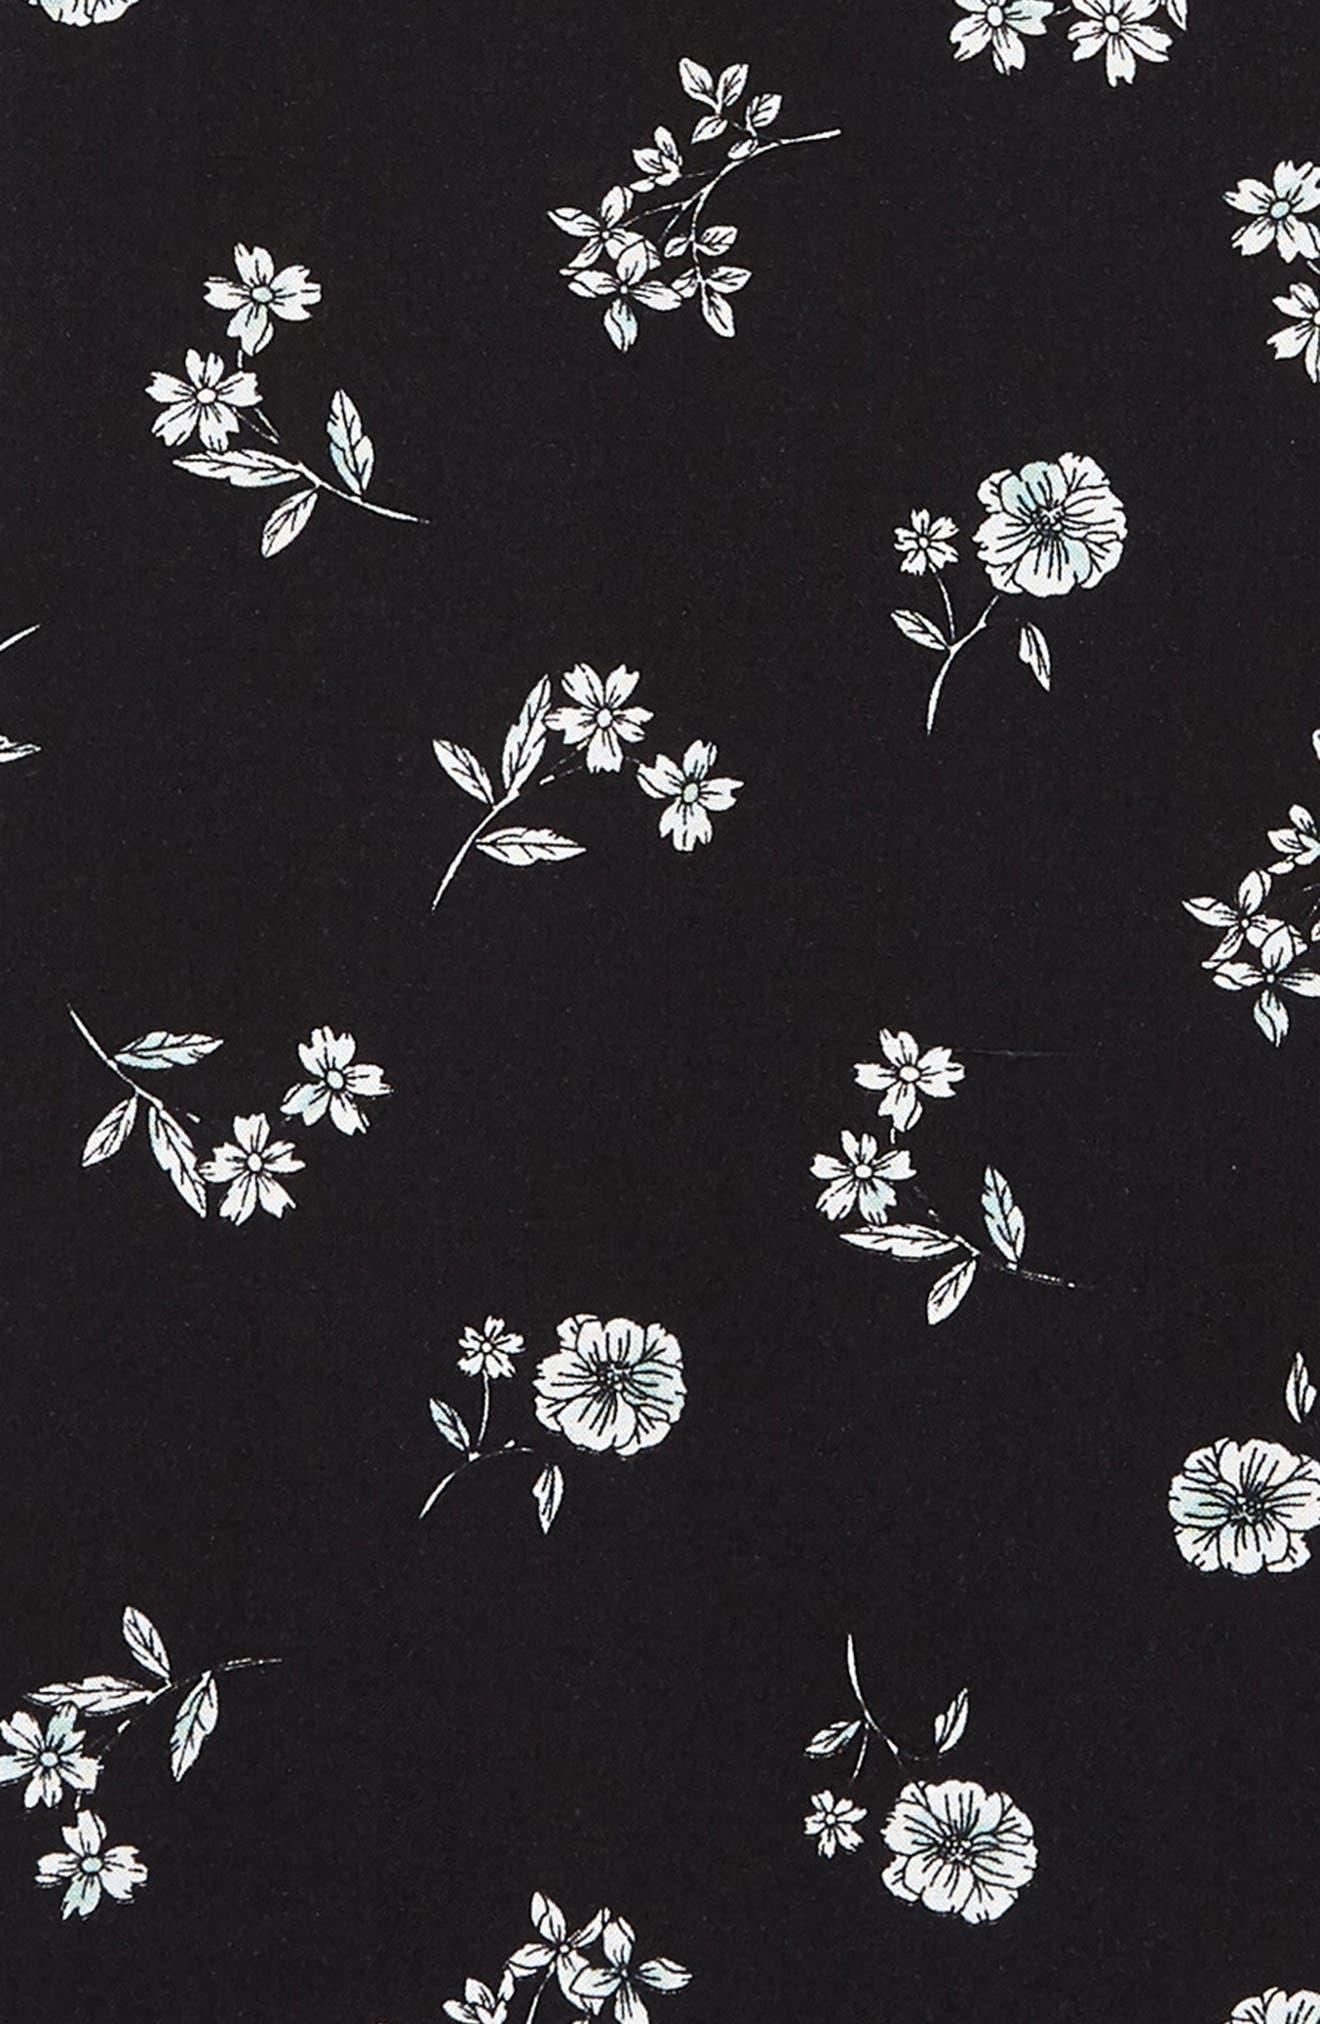 Floral Sleeveless Shift Dress,                             Alternate thumbnail 3, color,                             001